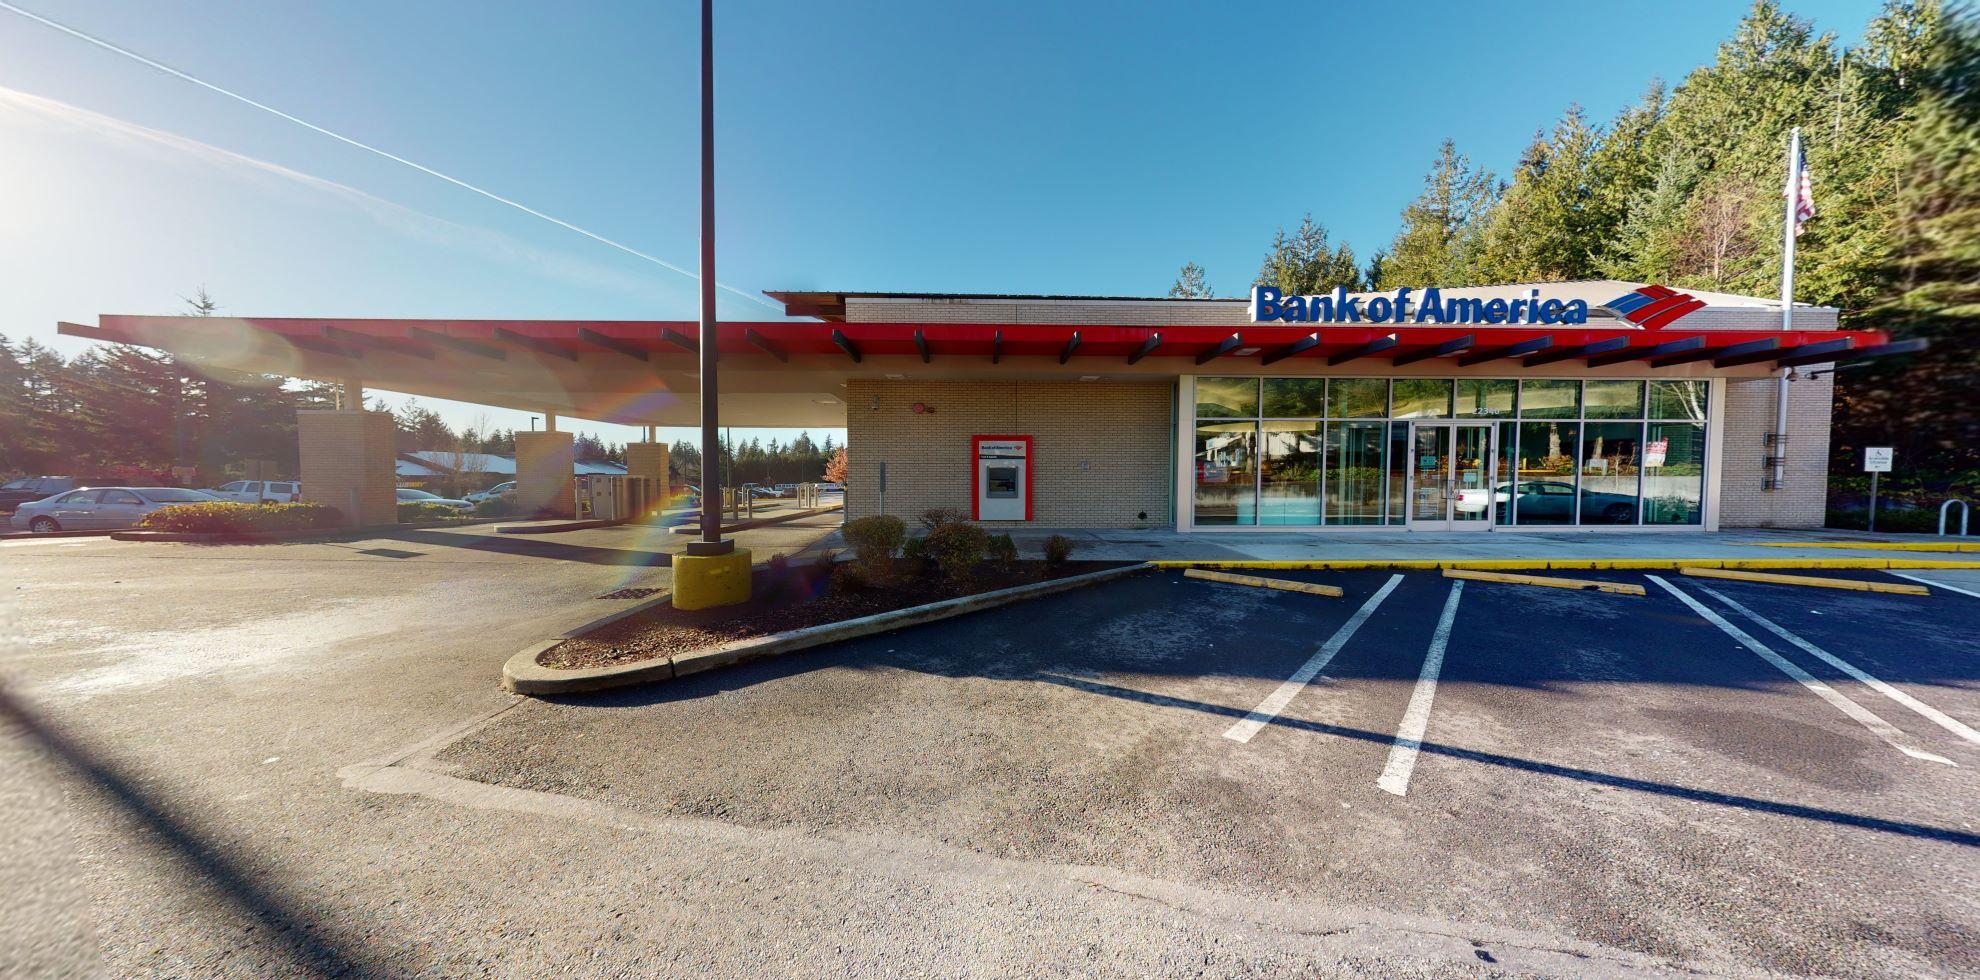 Bank of America financial center with drive-thru ATM | 22340 NE Marketplace Dr, Redmond, WA 98053